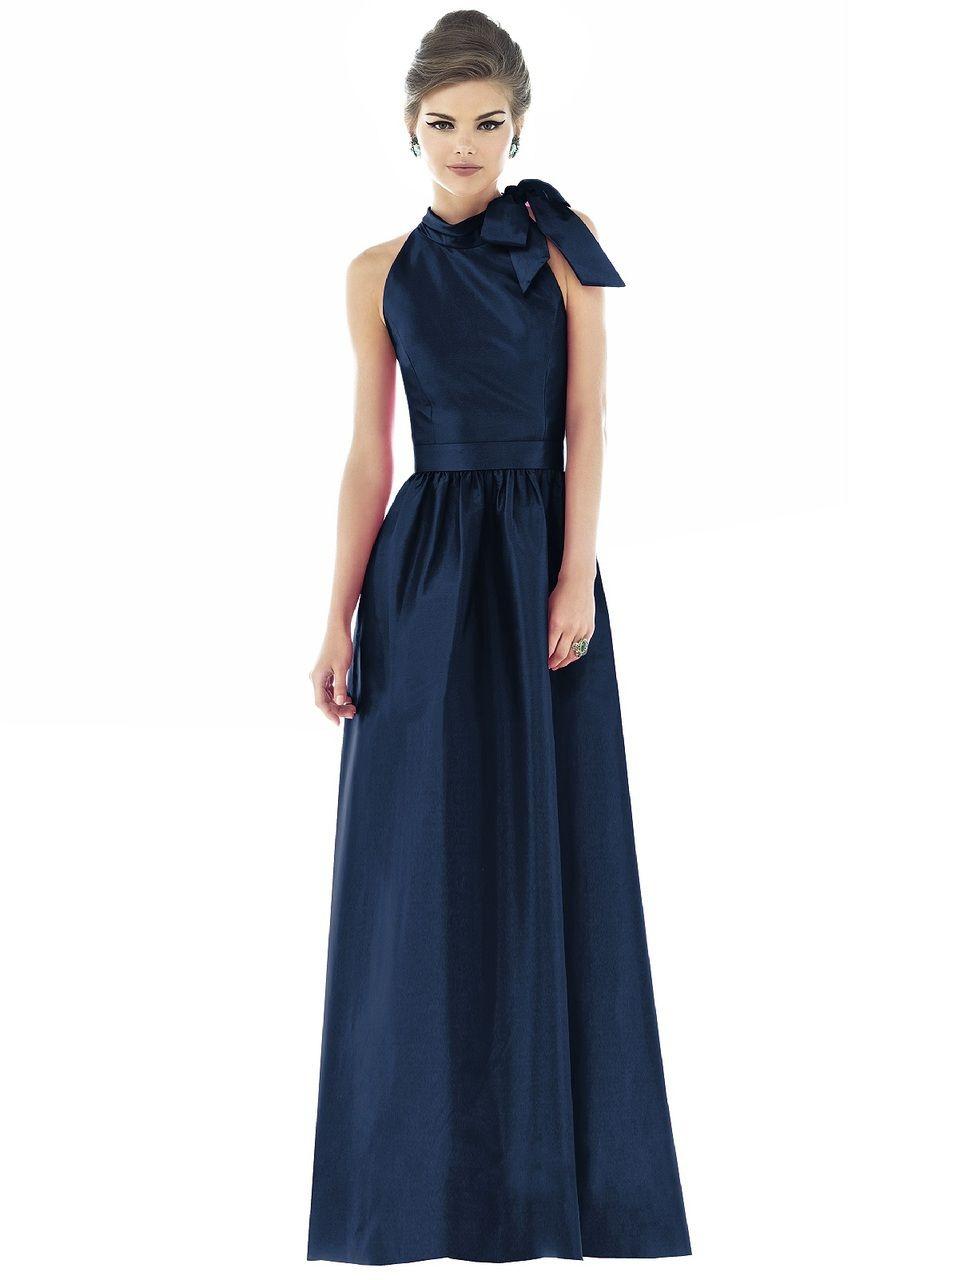 Alfred sung bridesmaid dress style d535 blush bridal blush alfred sung bridesmaid dress style d535 blush bridal ombrellifo Choice Image